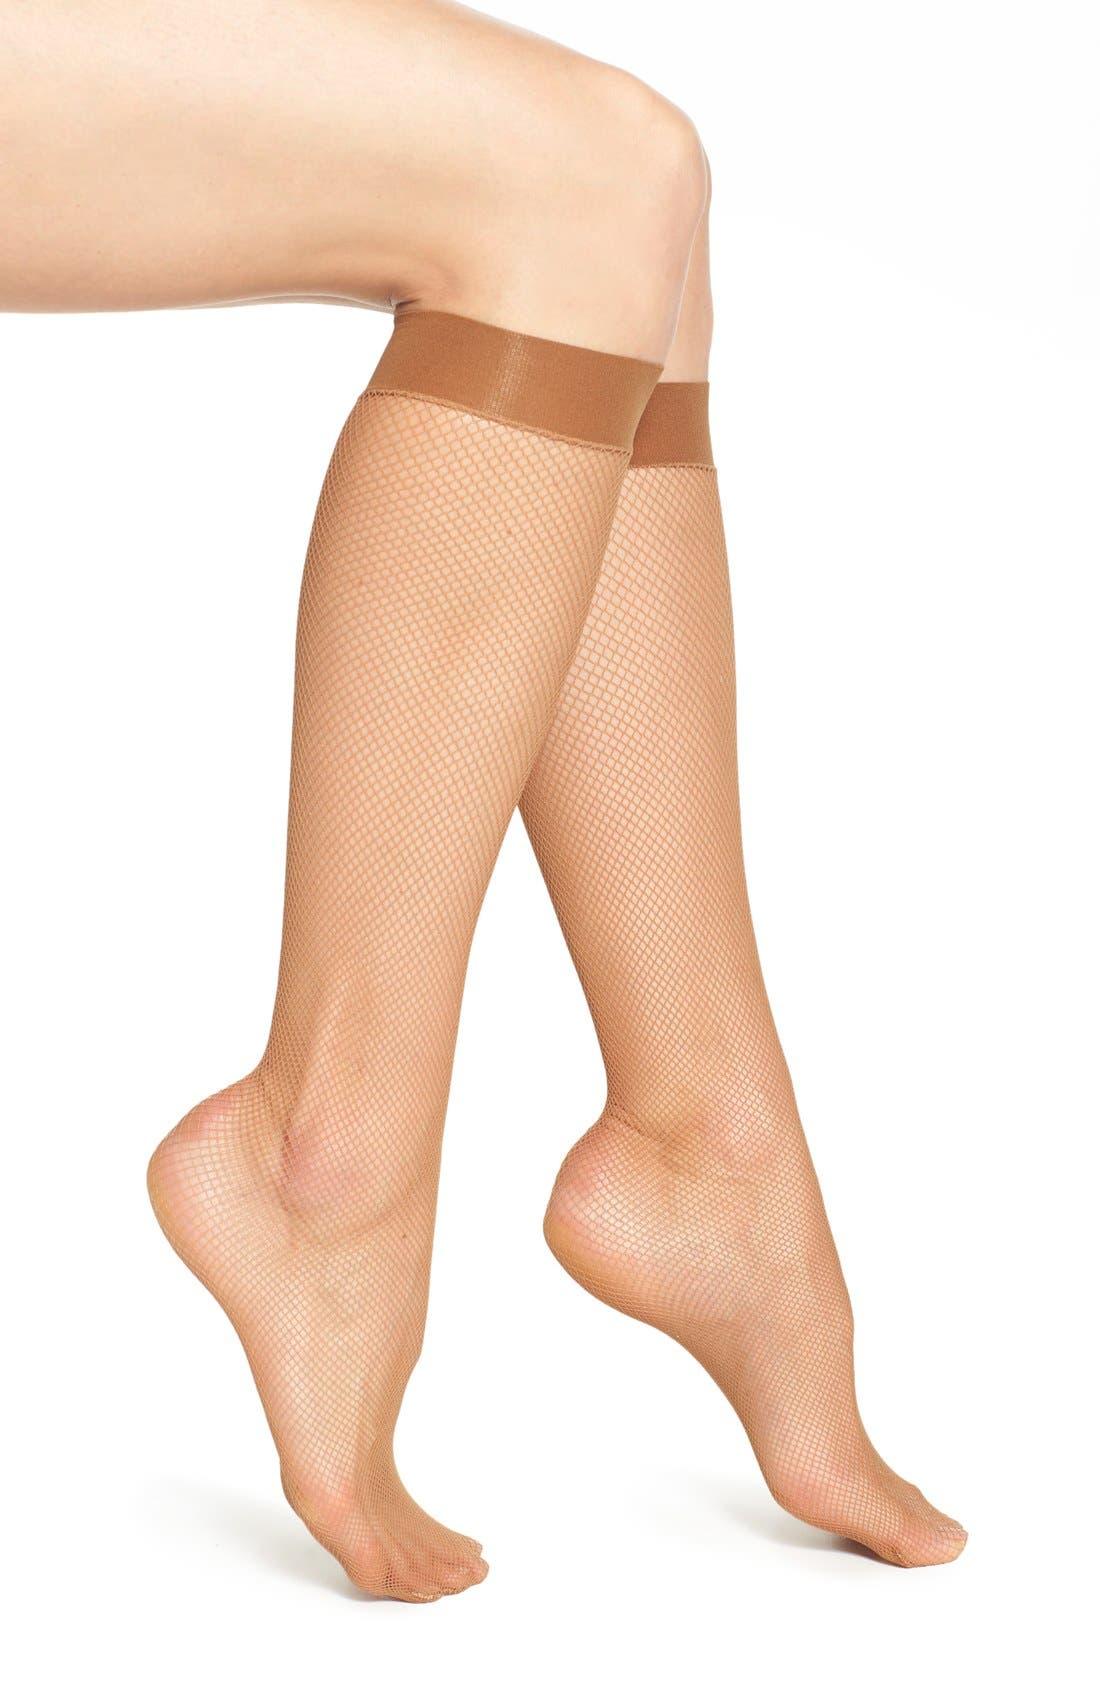 'Twenties' Fishnet Knee High Socks,                             Main thumbnail 1, color,                             243